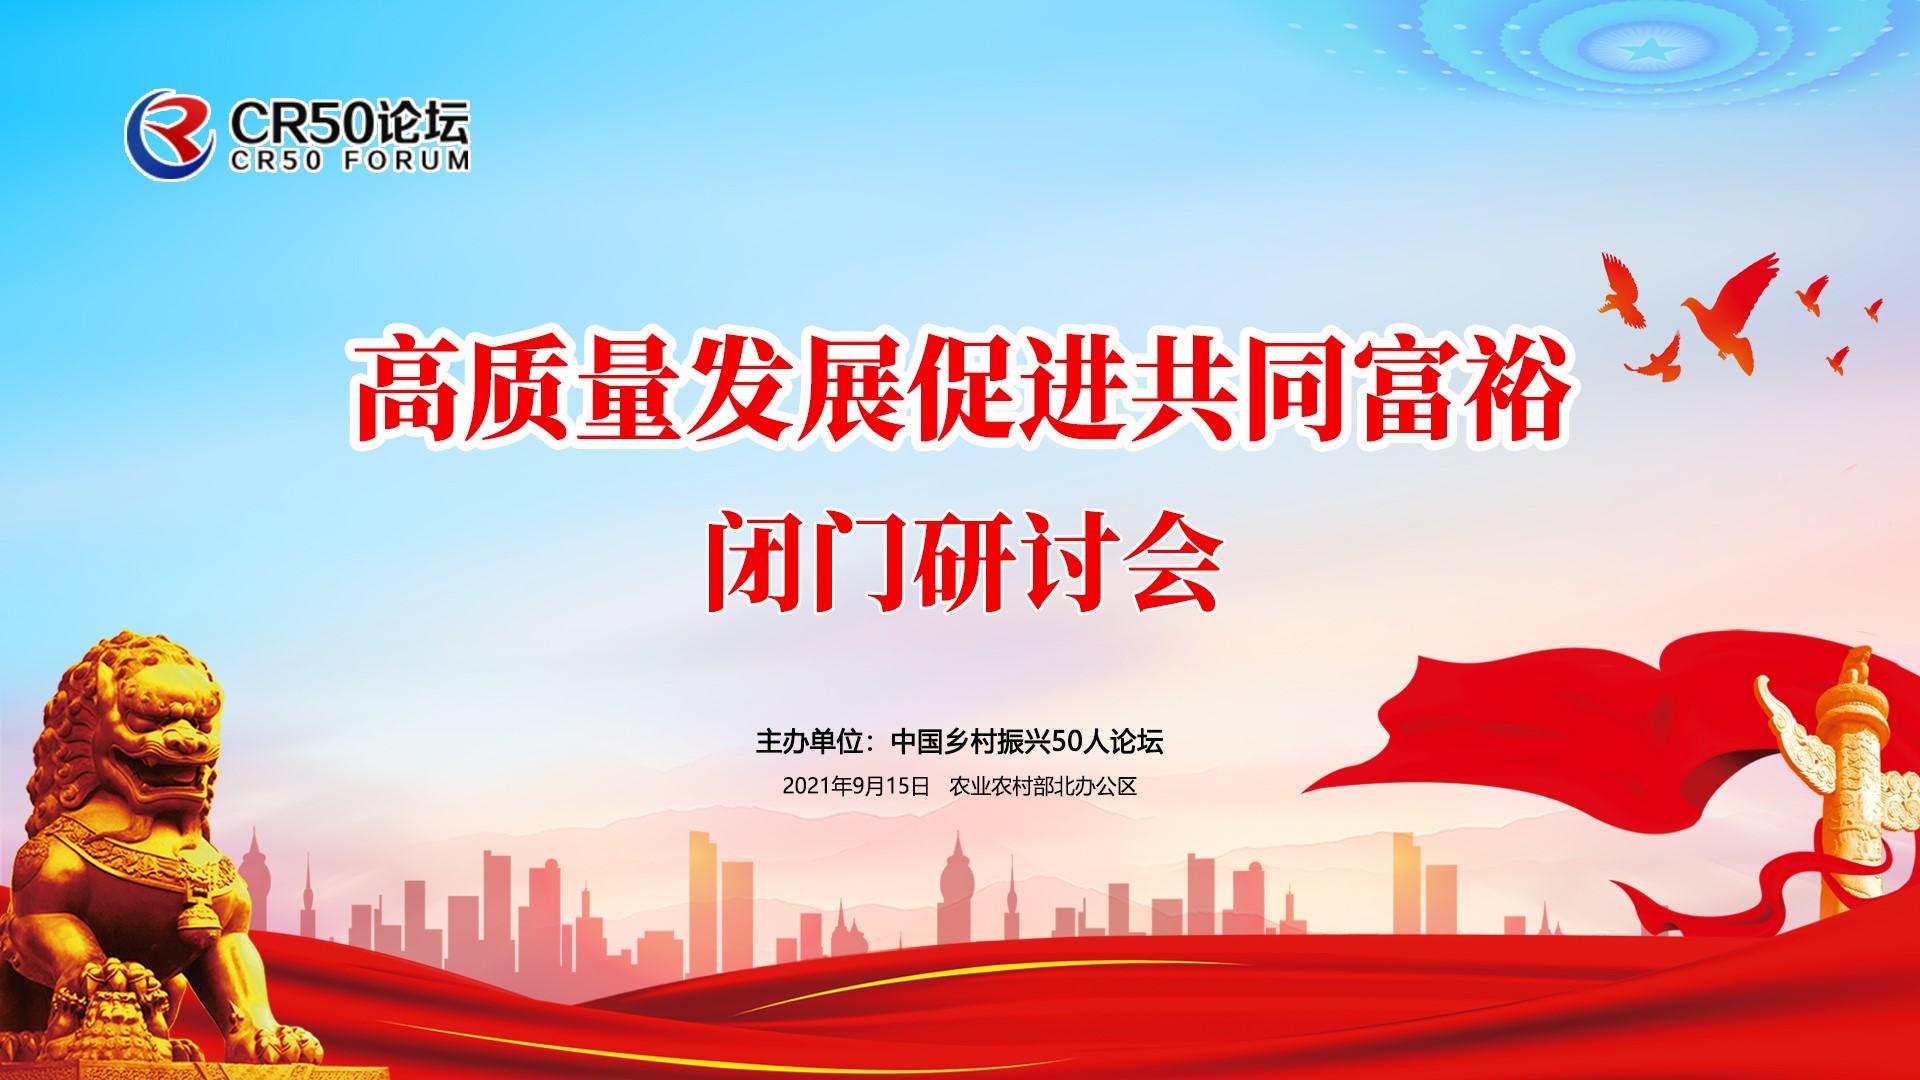 "CR50第二次闭门研讨会""高质量发展促进共同富裕""在京举行"